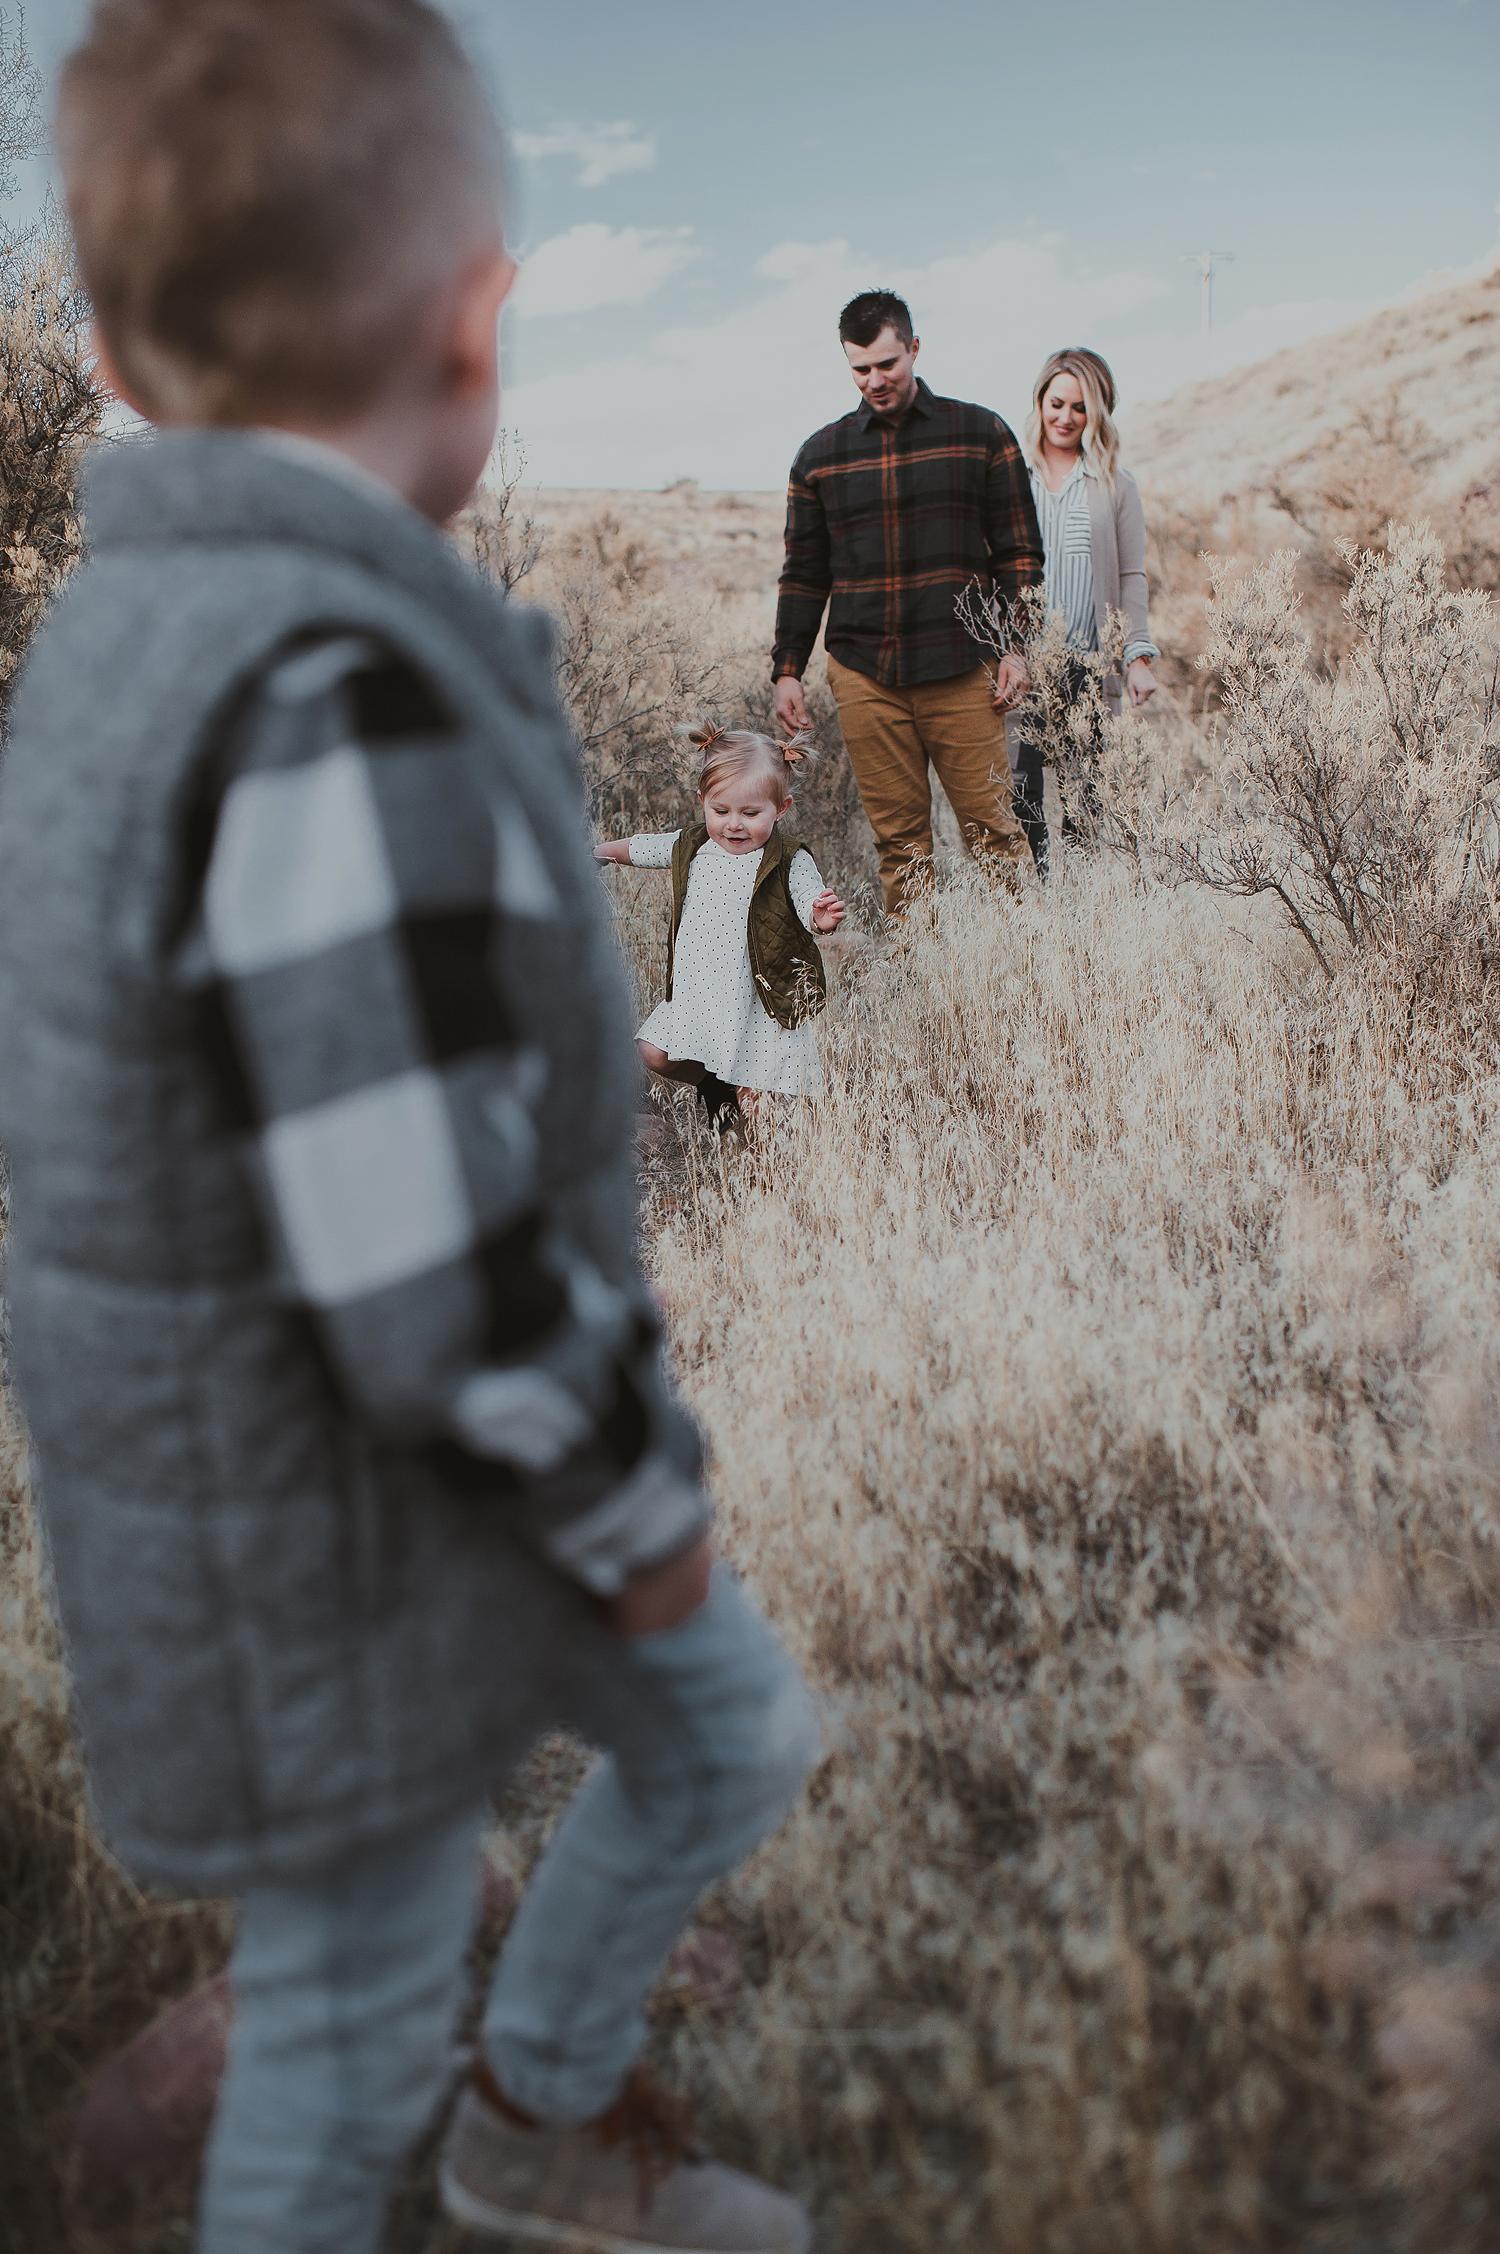 Family walking through grassy field